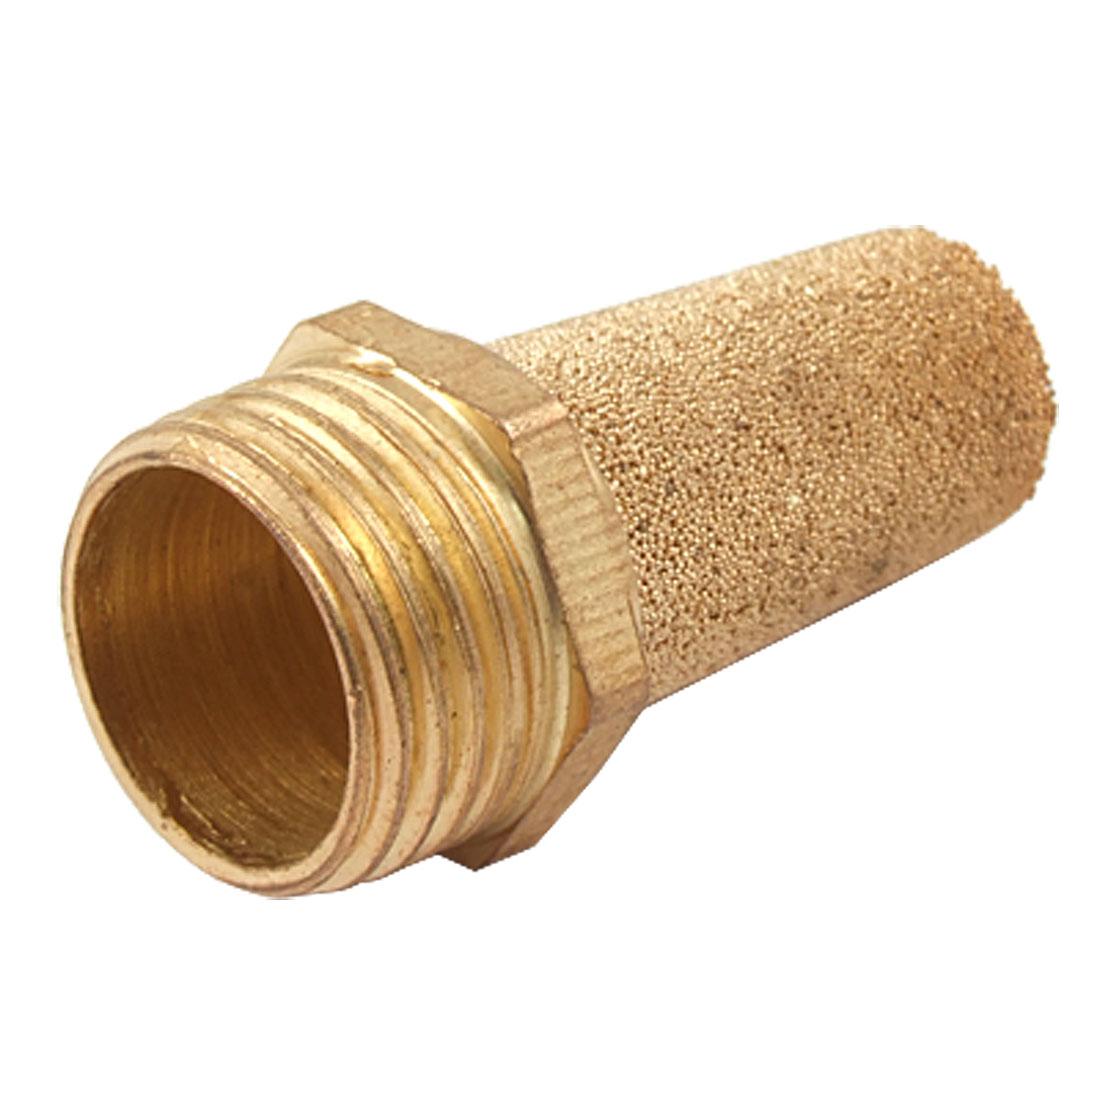 20mm Thread Brass Cylinder Pneumatic Sound Eliminator Muffler